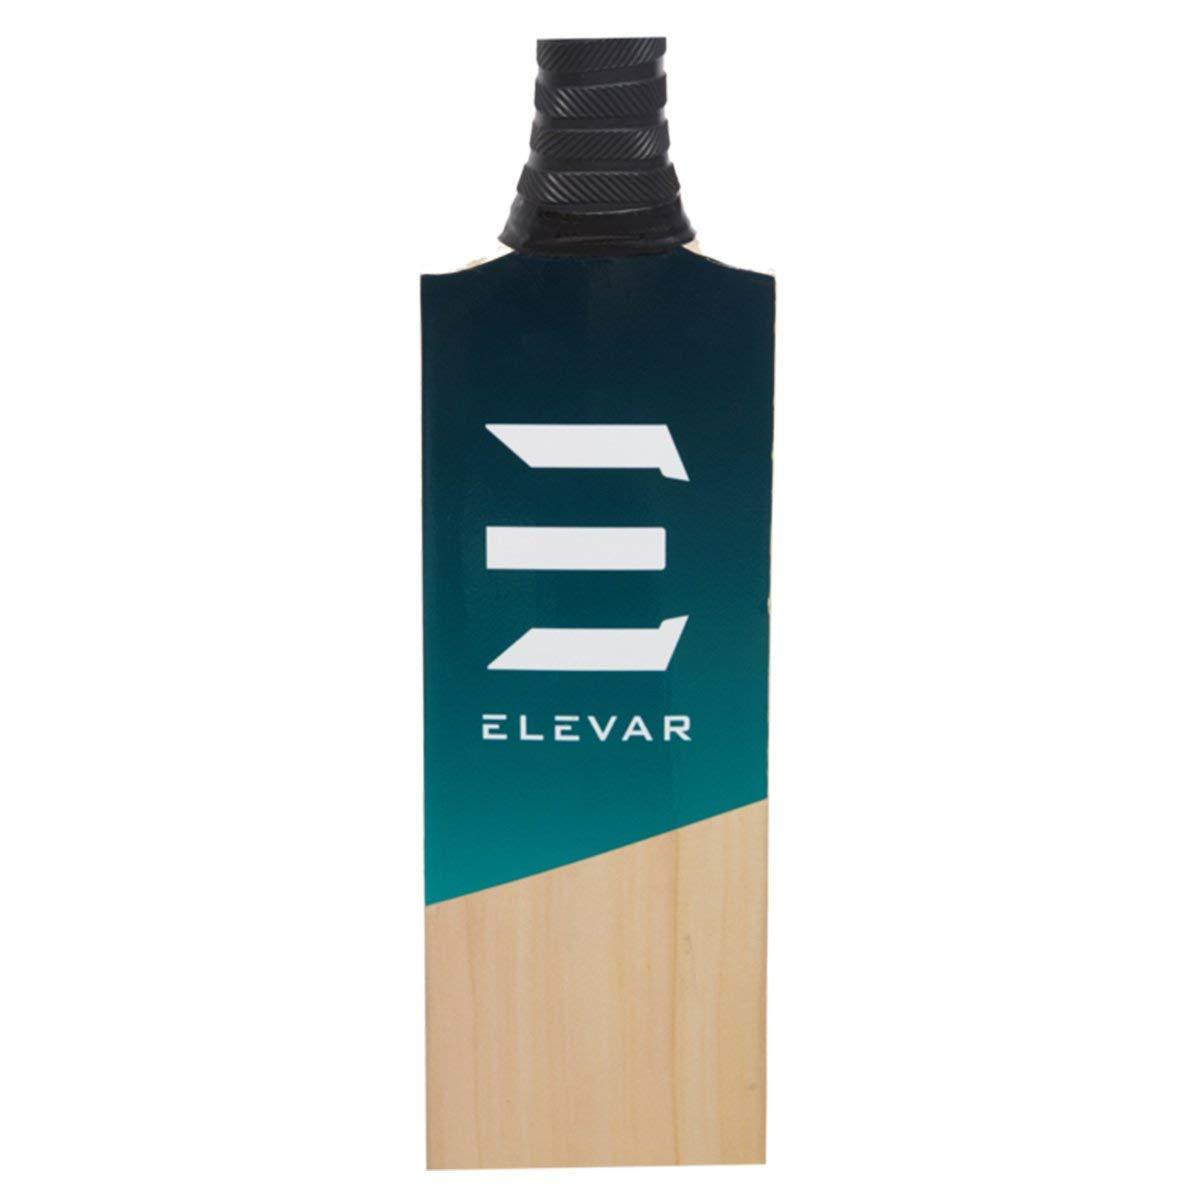 Kashmir Willow Bat for Season /& Hard Tennis Ball ELEVAR Kashmir